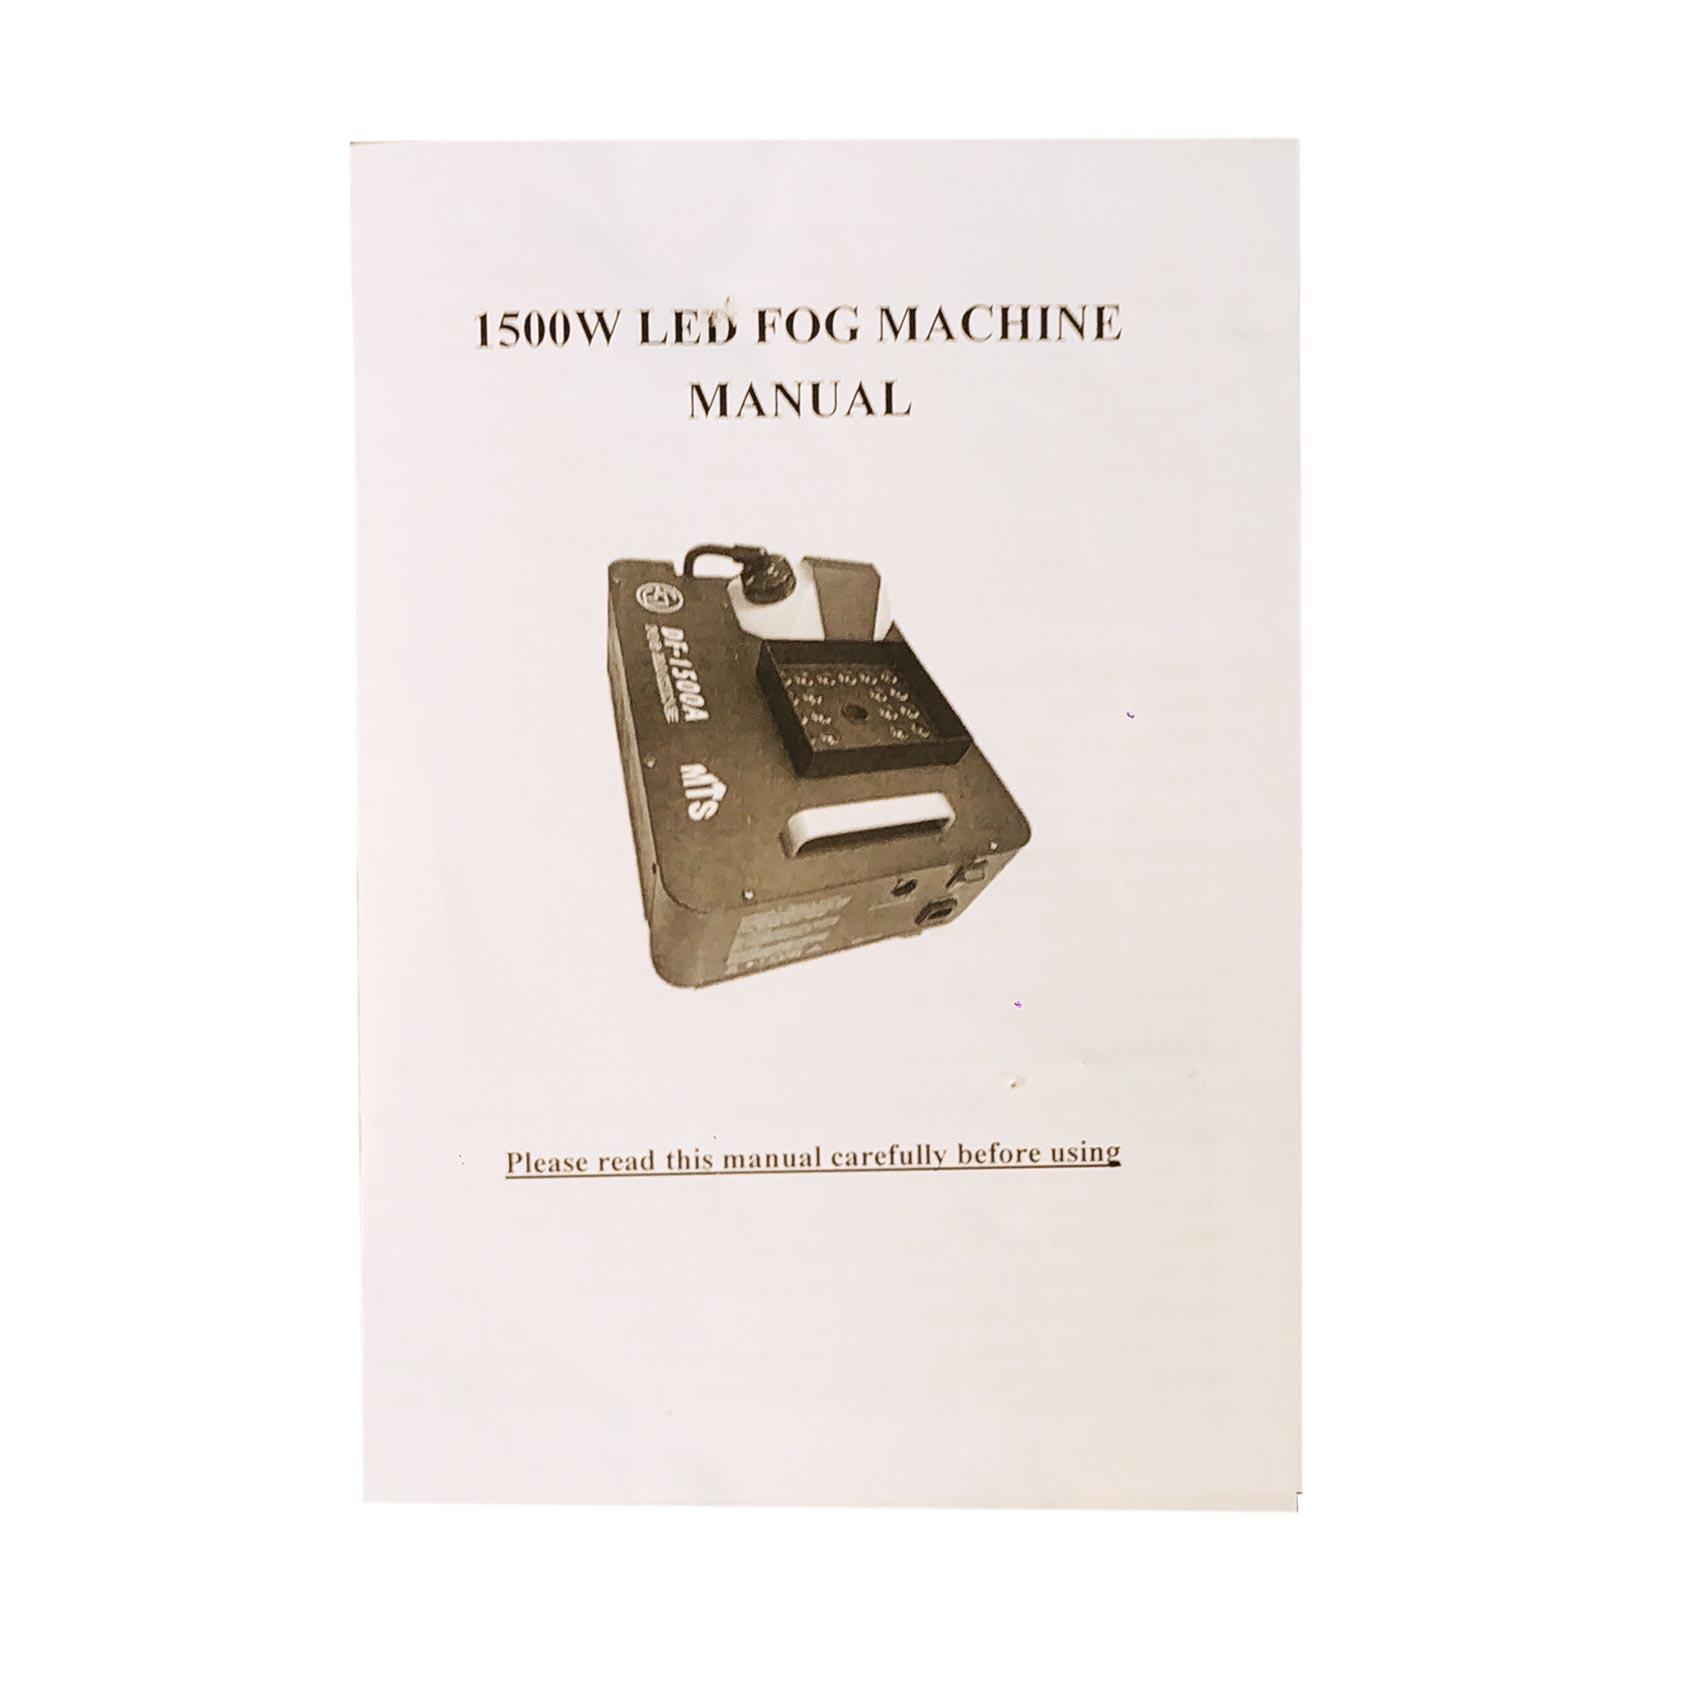 ۱۵۰۰-catalog